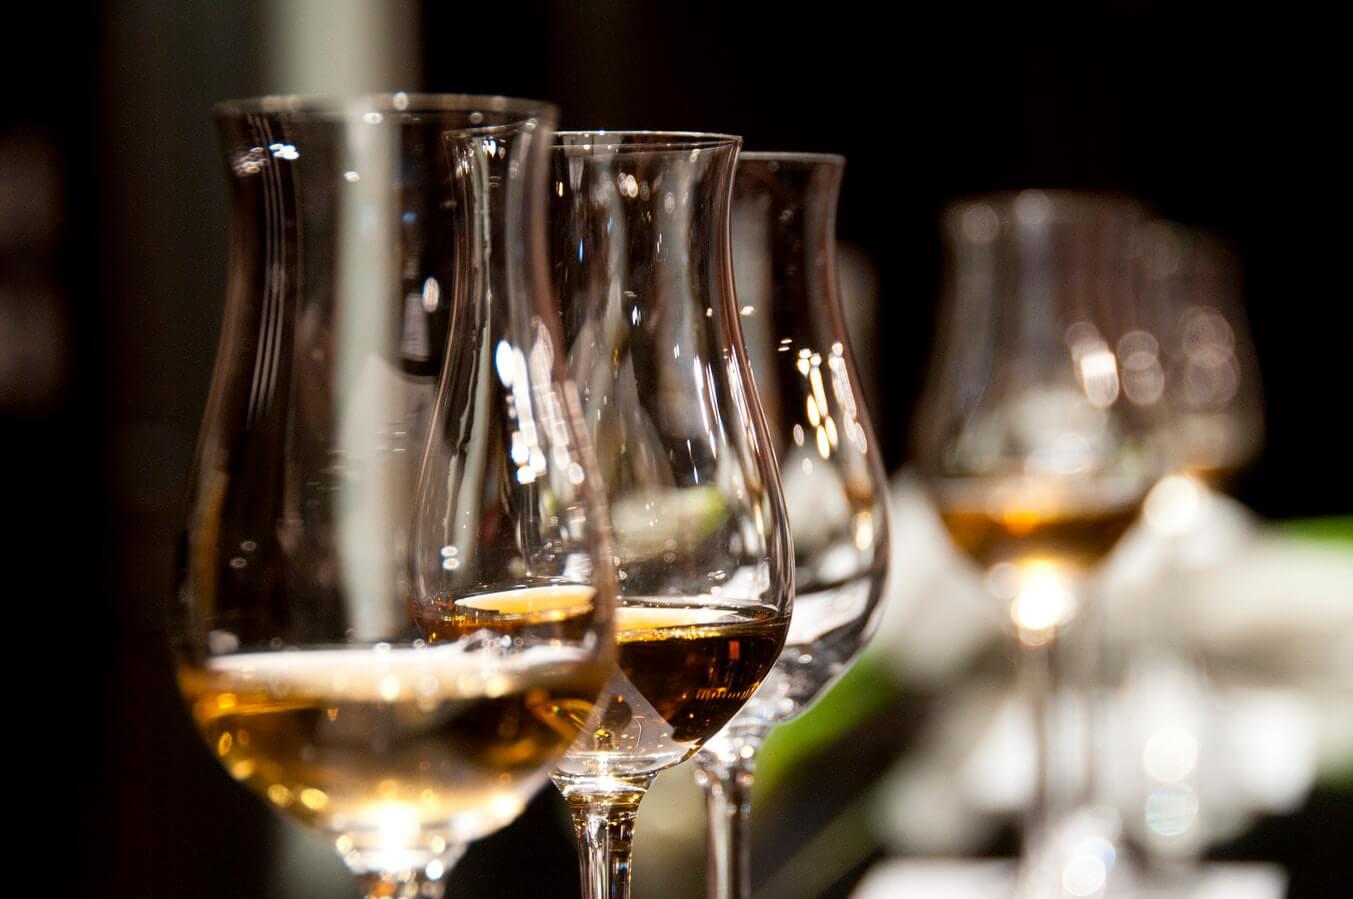 Mood-Setting des Wheel of Spirits zum Thema Scotch & Irish Whisk(e)y